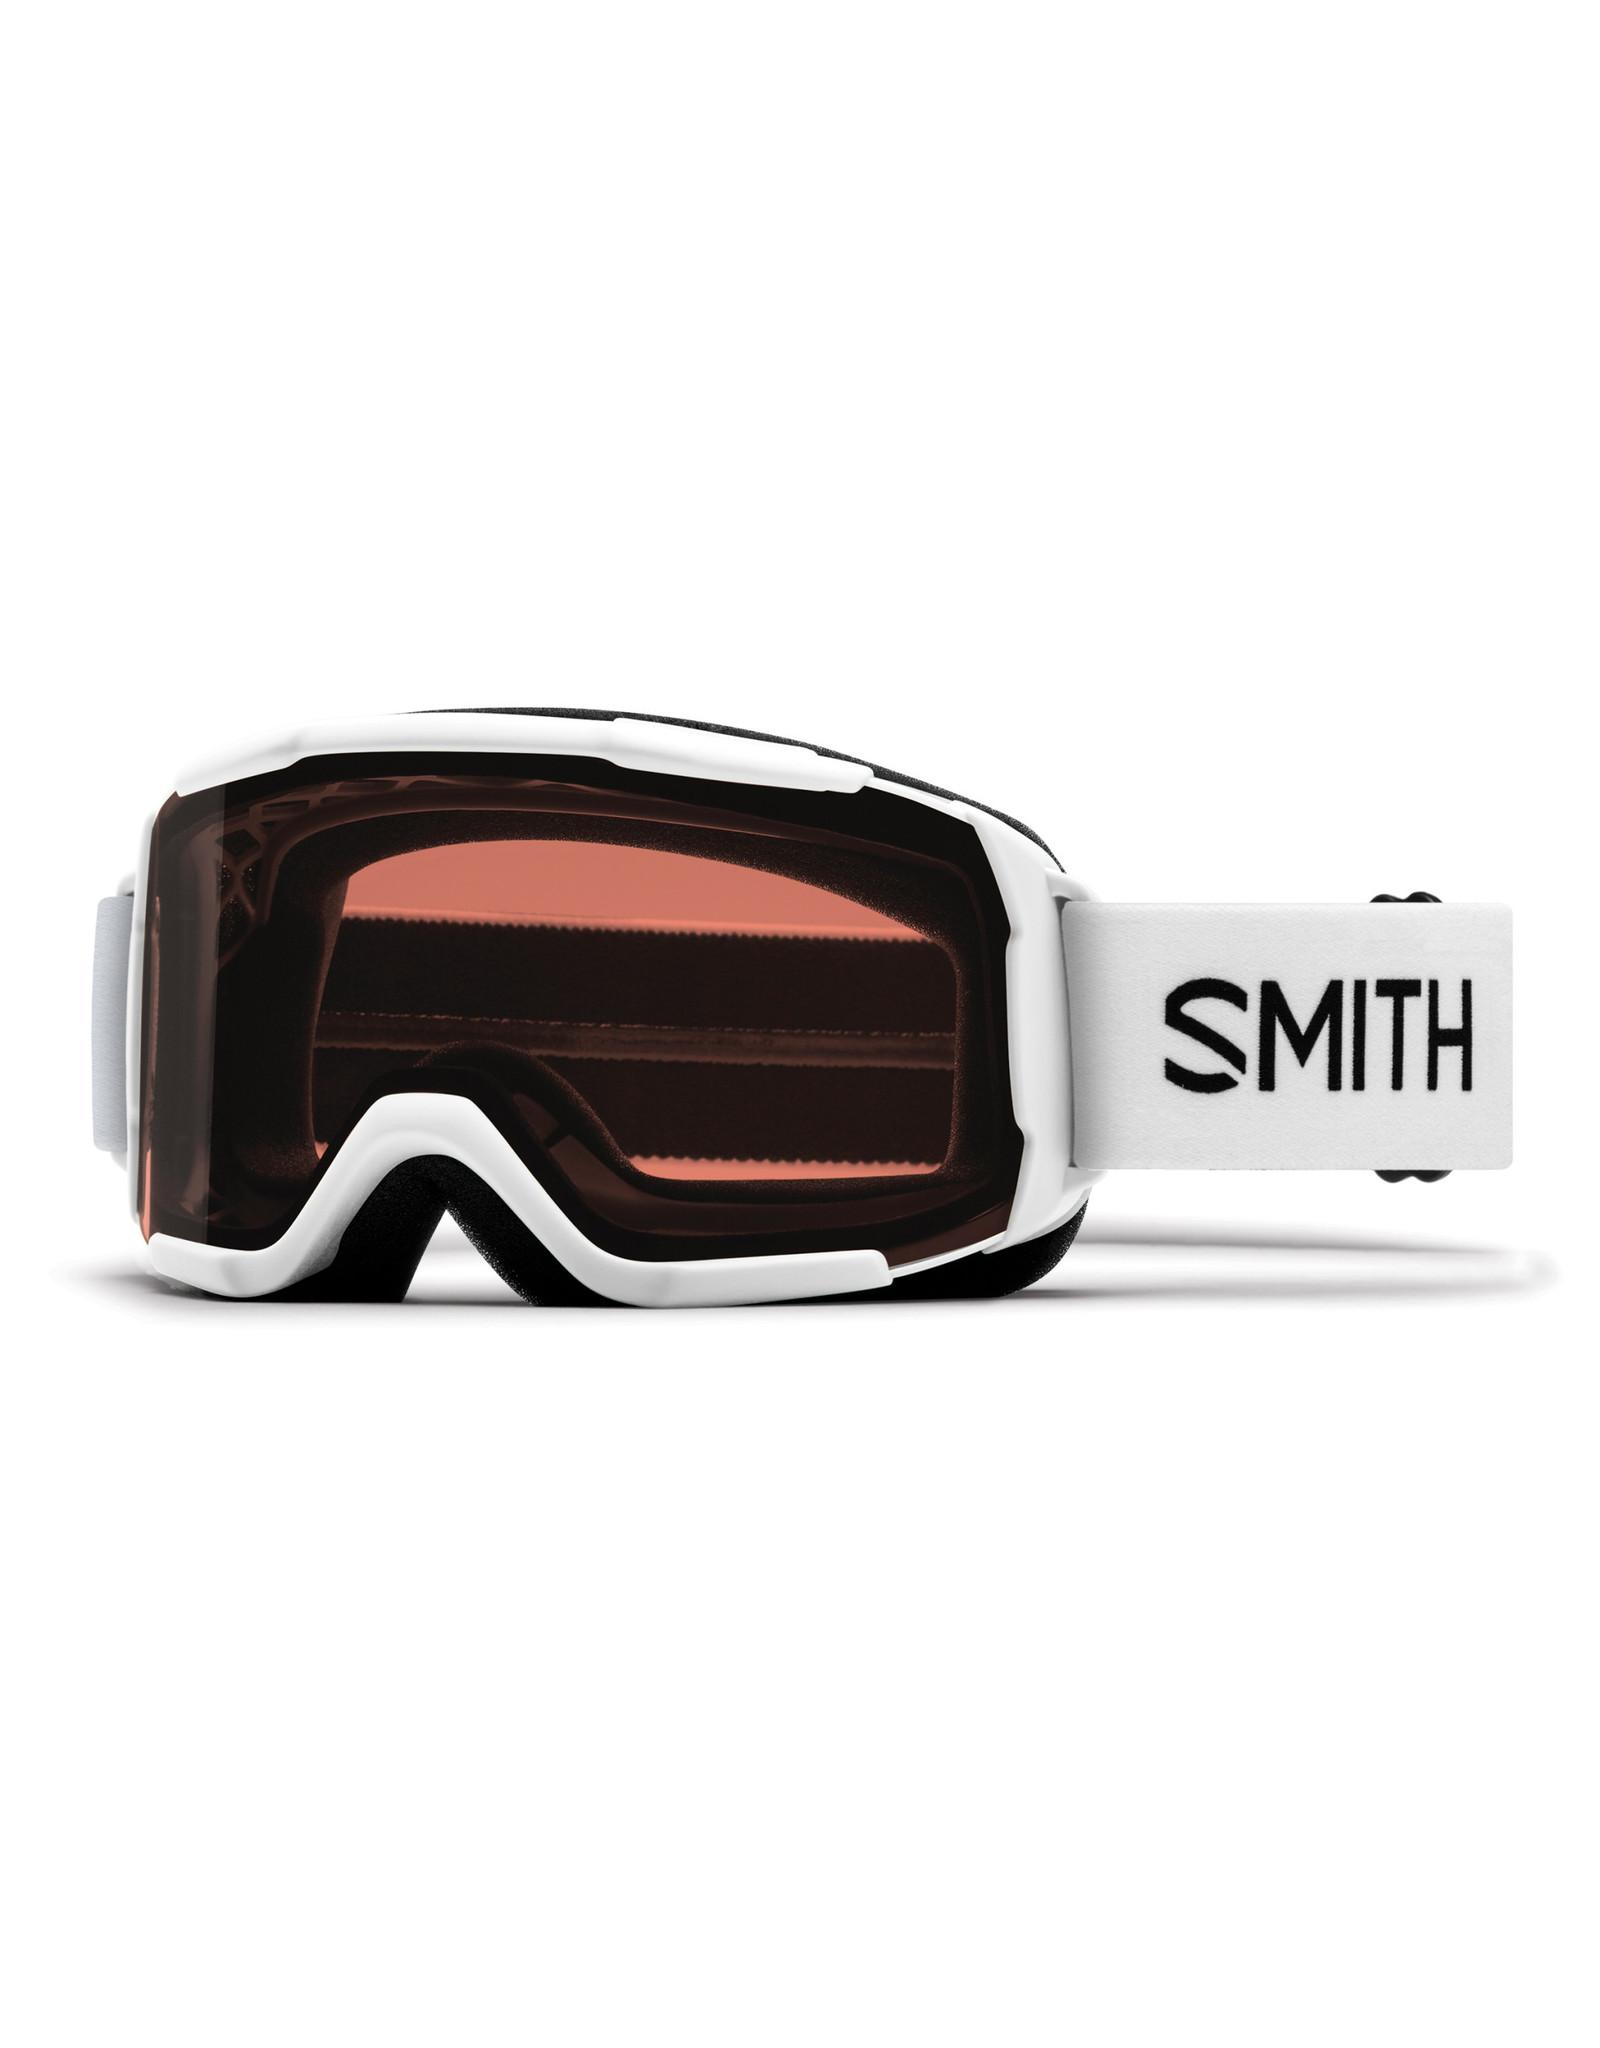 Smith SMITH DAREDEVIL WHITE 20 LUNETTE SKI ENFANT